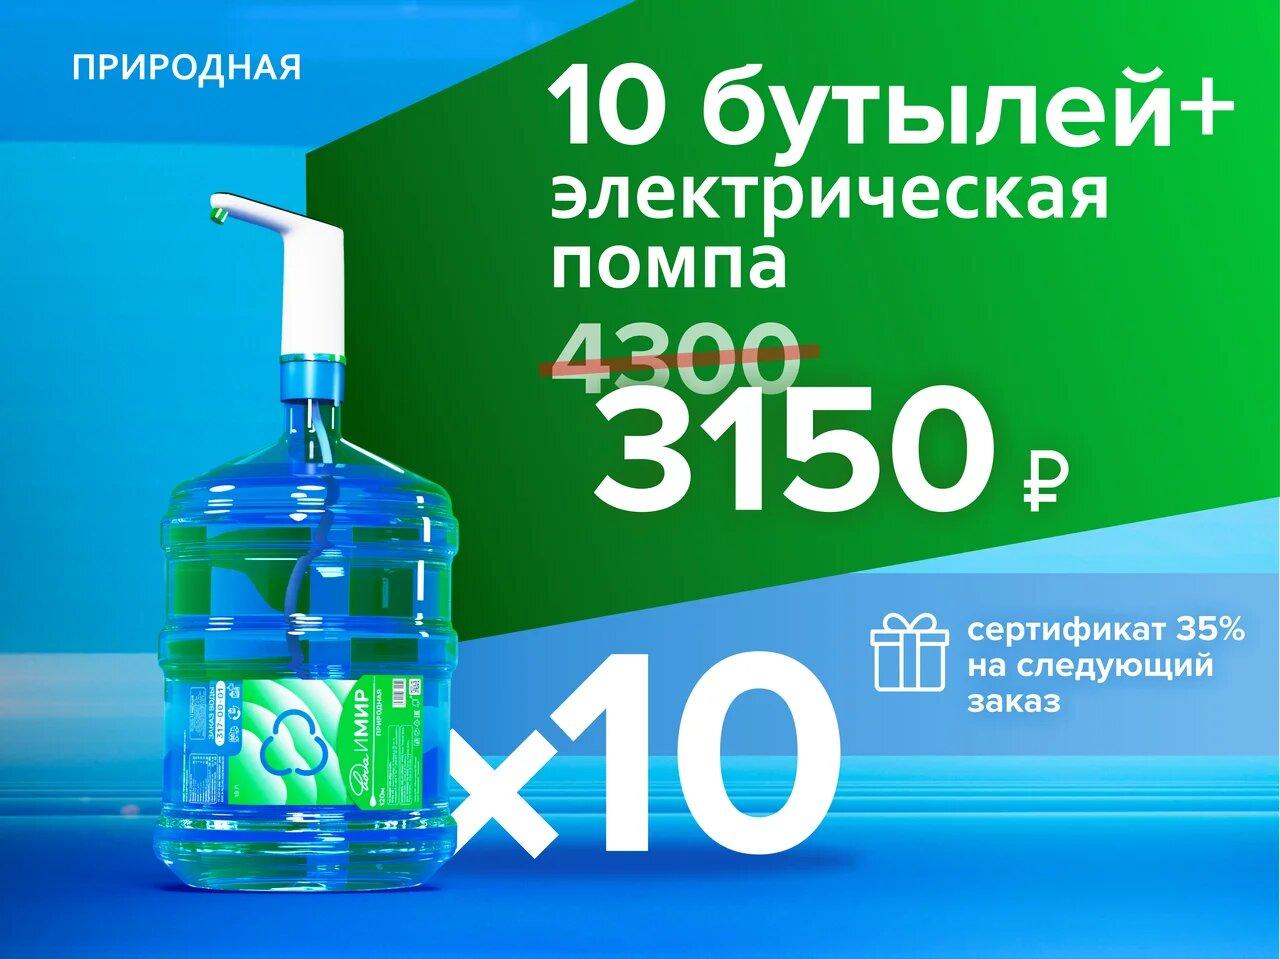 Природная элетр. помпа х10